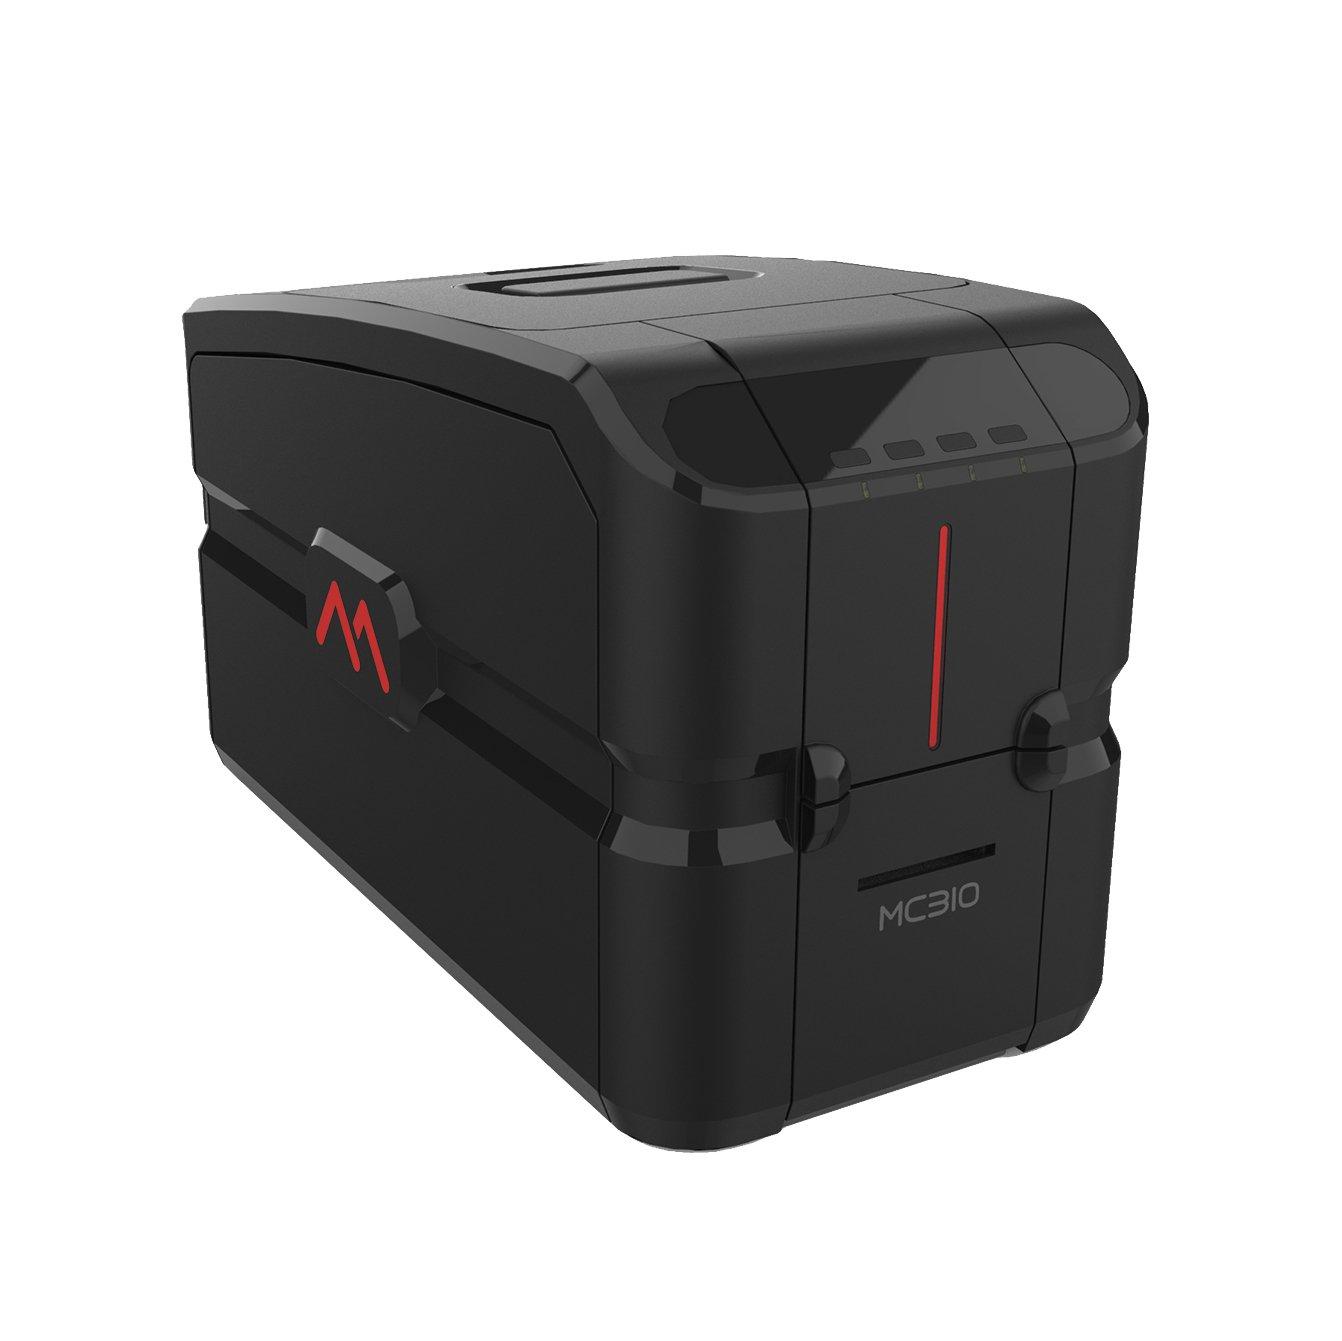 An image of Matica MC310 ID Card Printer - Dual Sided